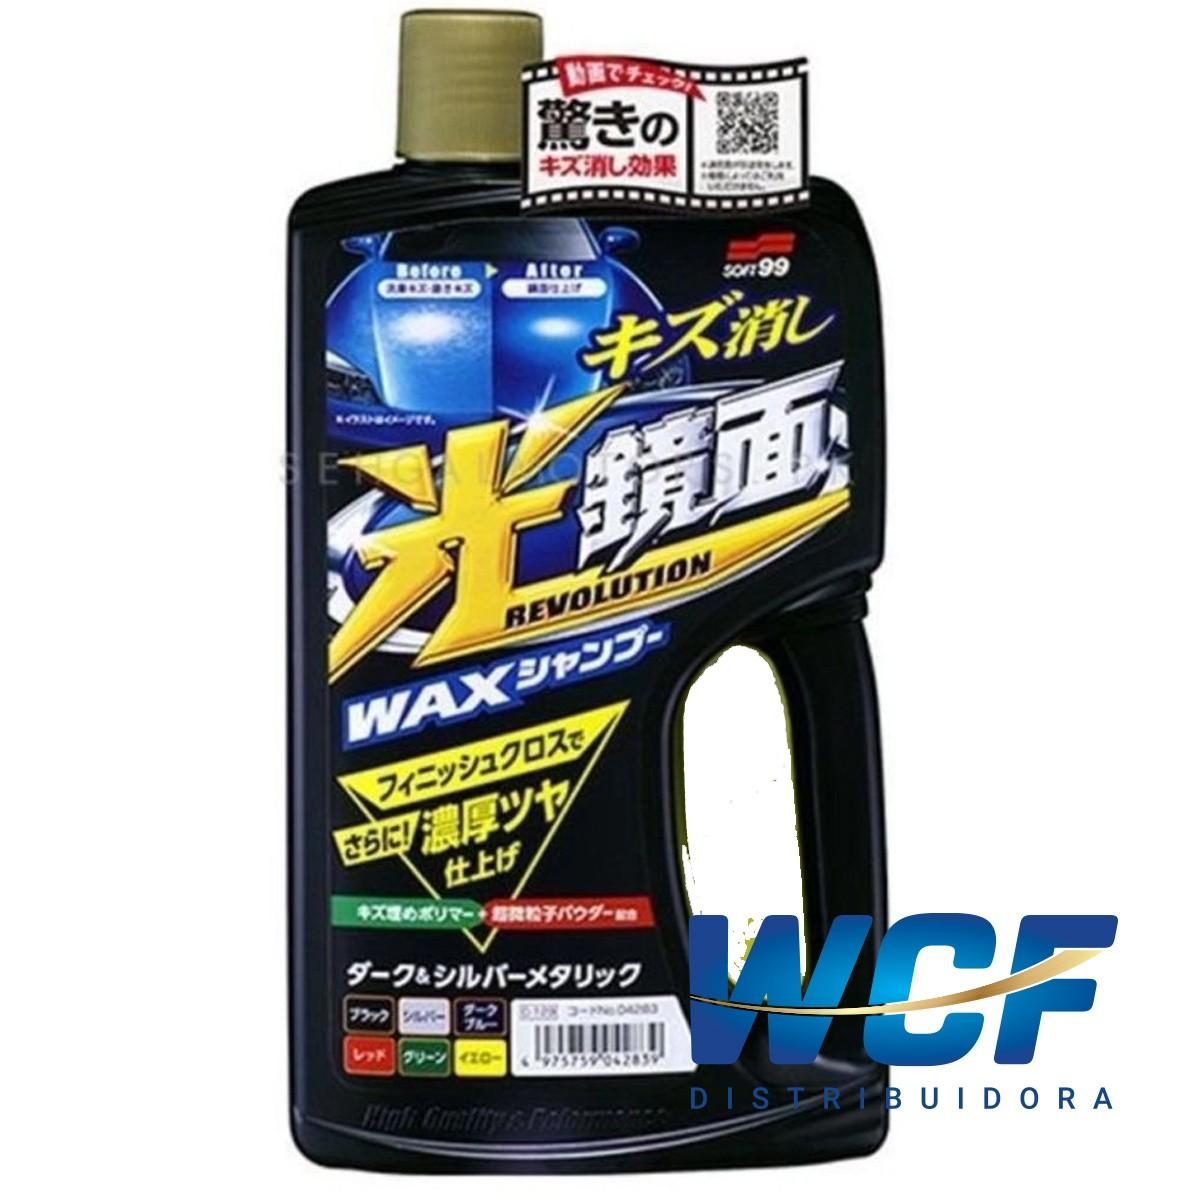 SOFT99 SHAMPOO DARK NEW SCRATH CLEANER 0,700 ML